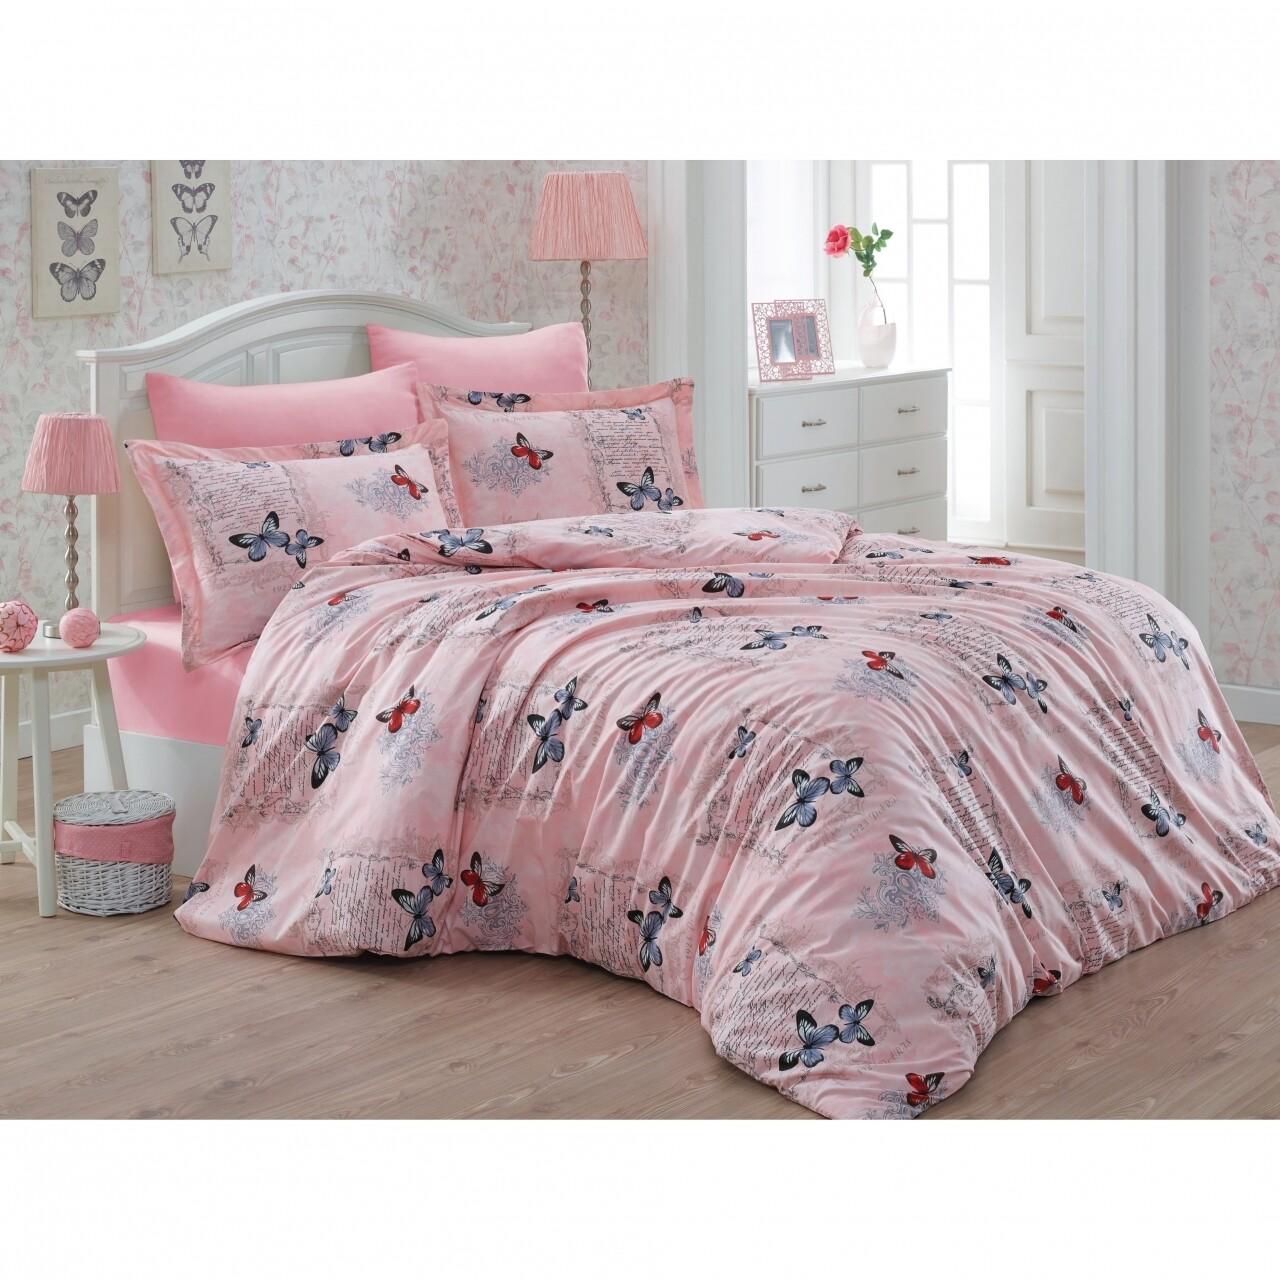 Lenjerie de pat dubla Papillon Bedora, 6 piese, 100% bumbac, roz